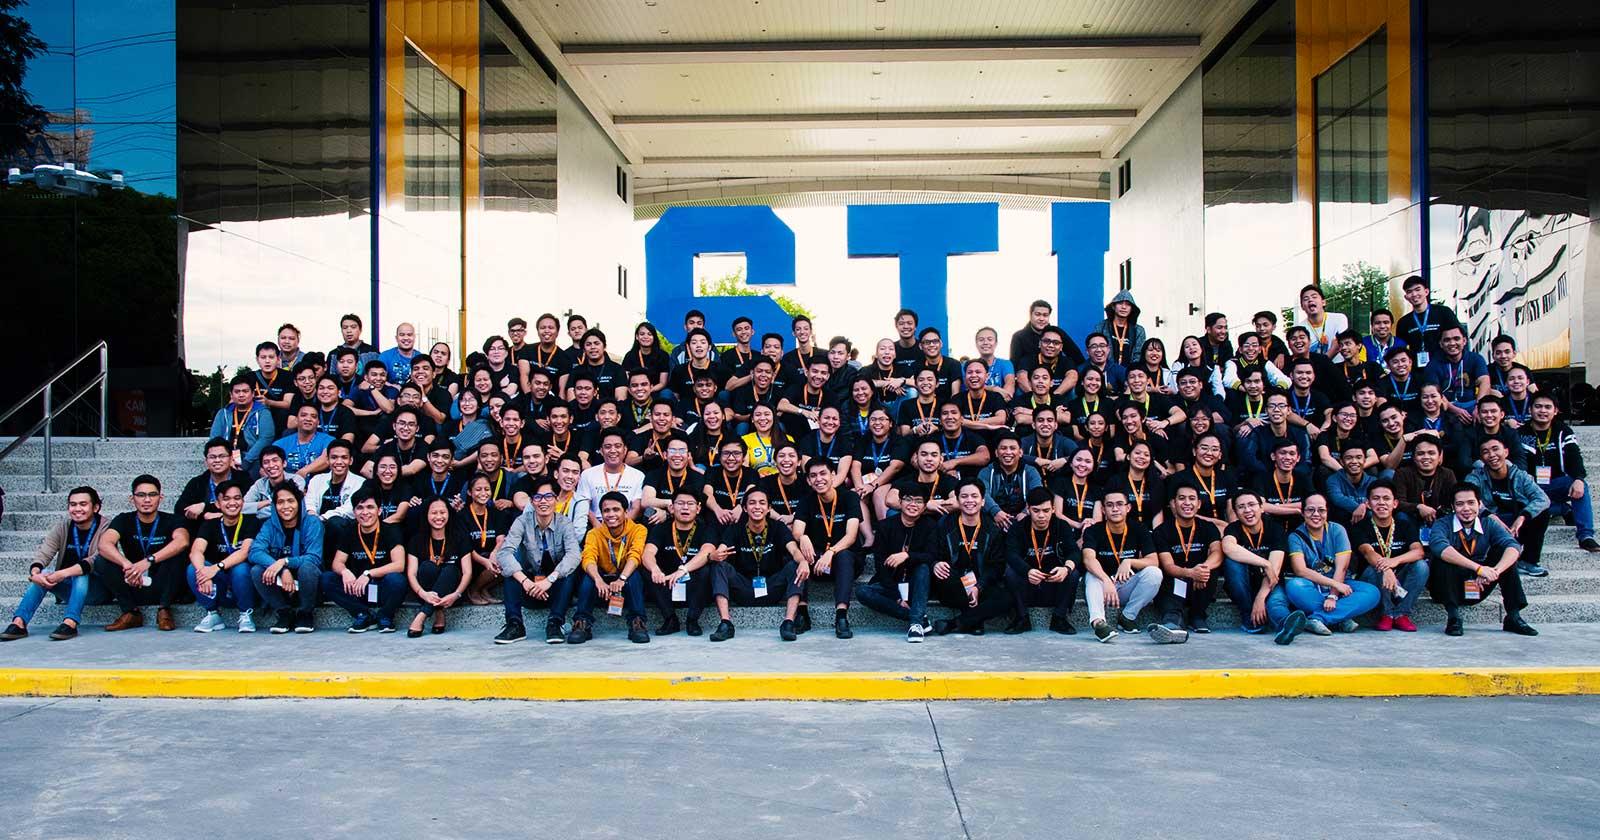 DepEd Rizal delivers thousands of ALS graduates | STI